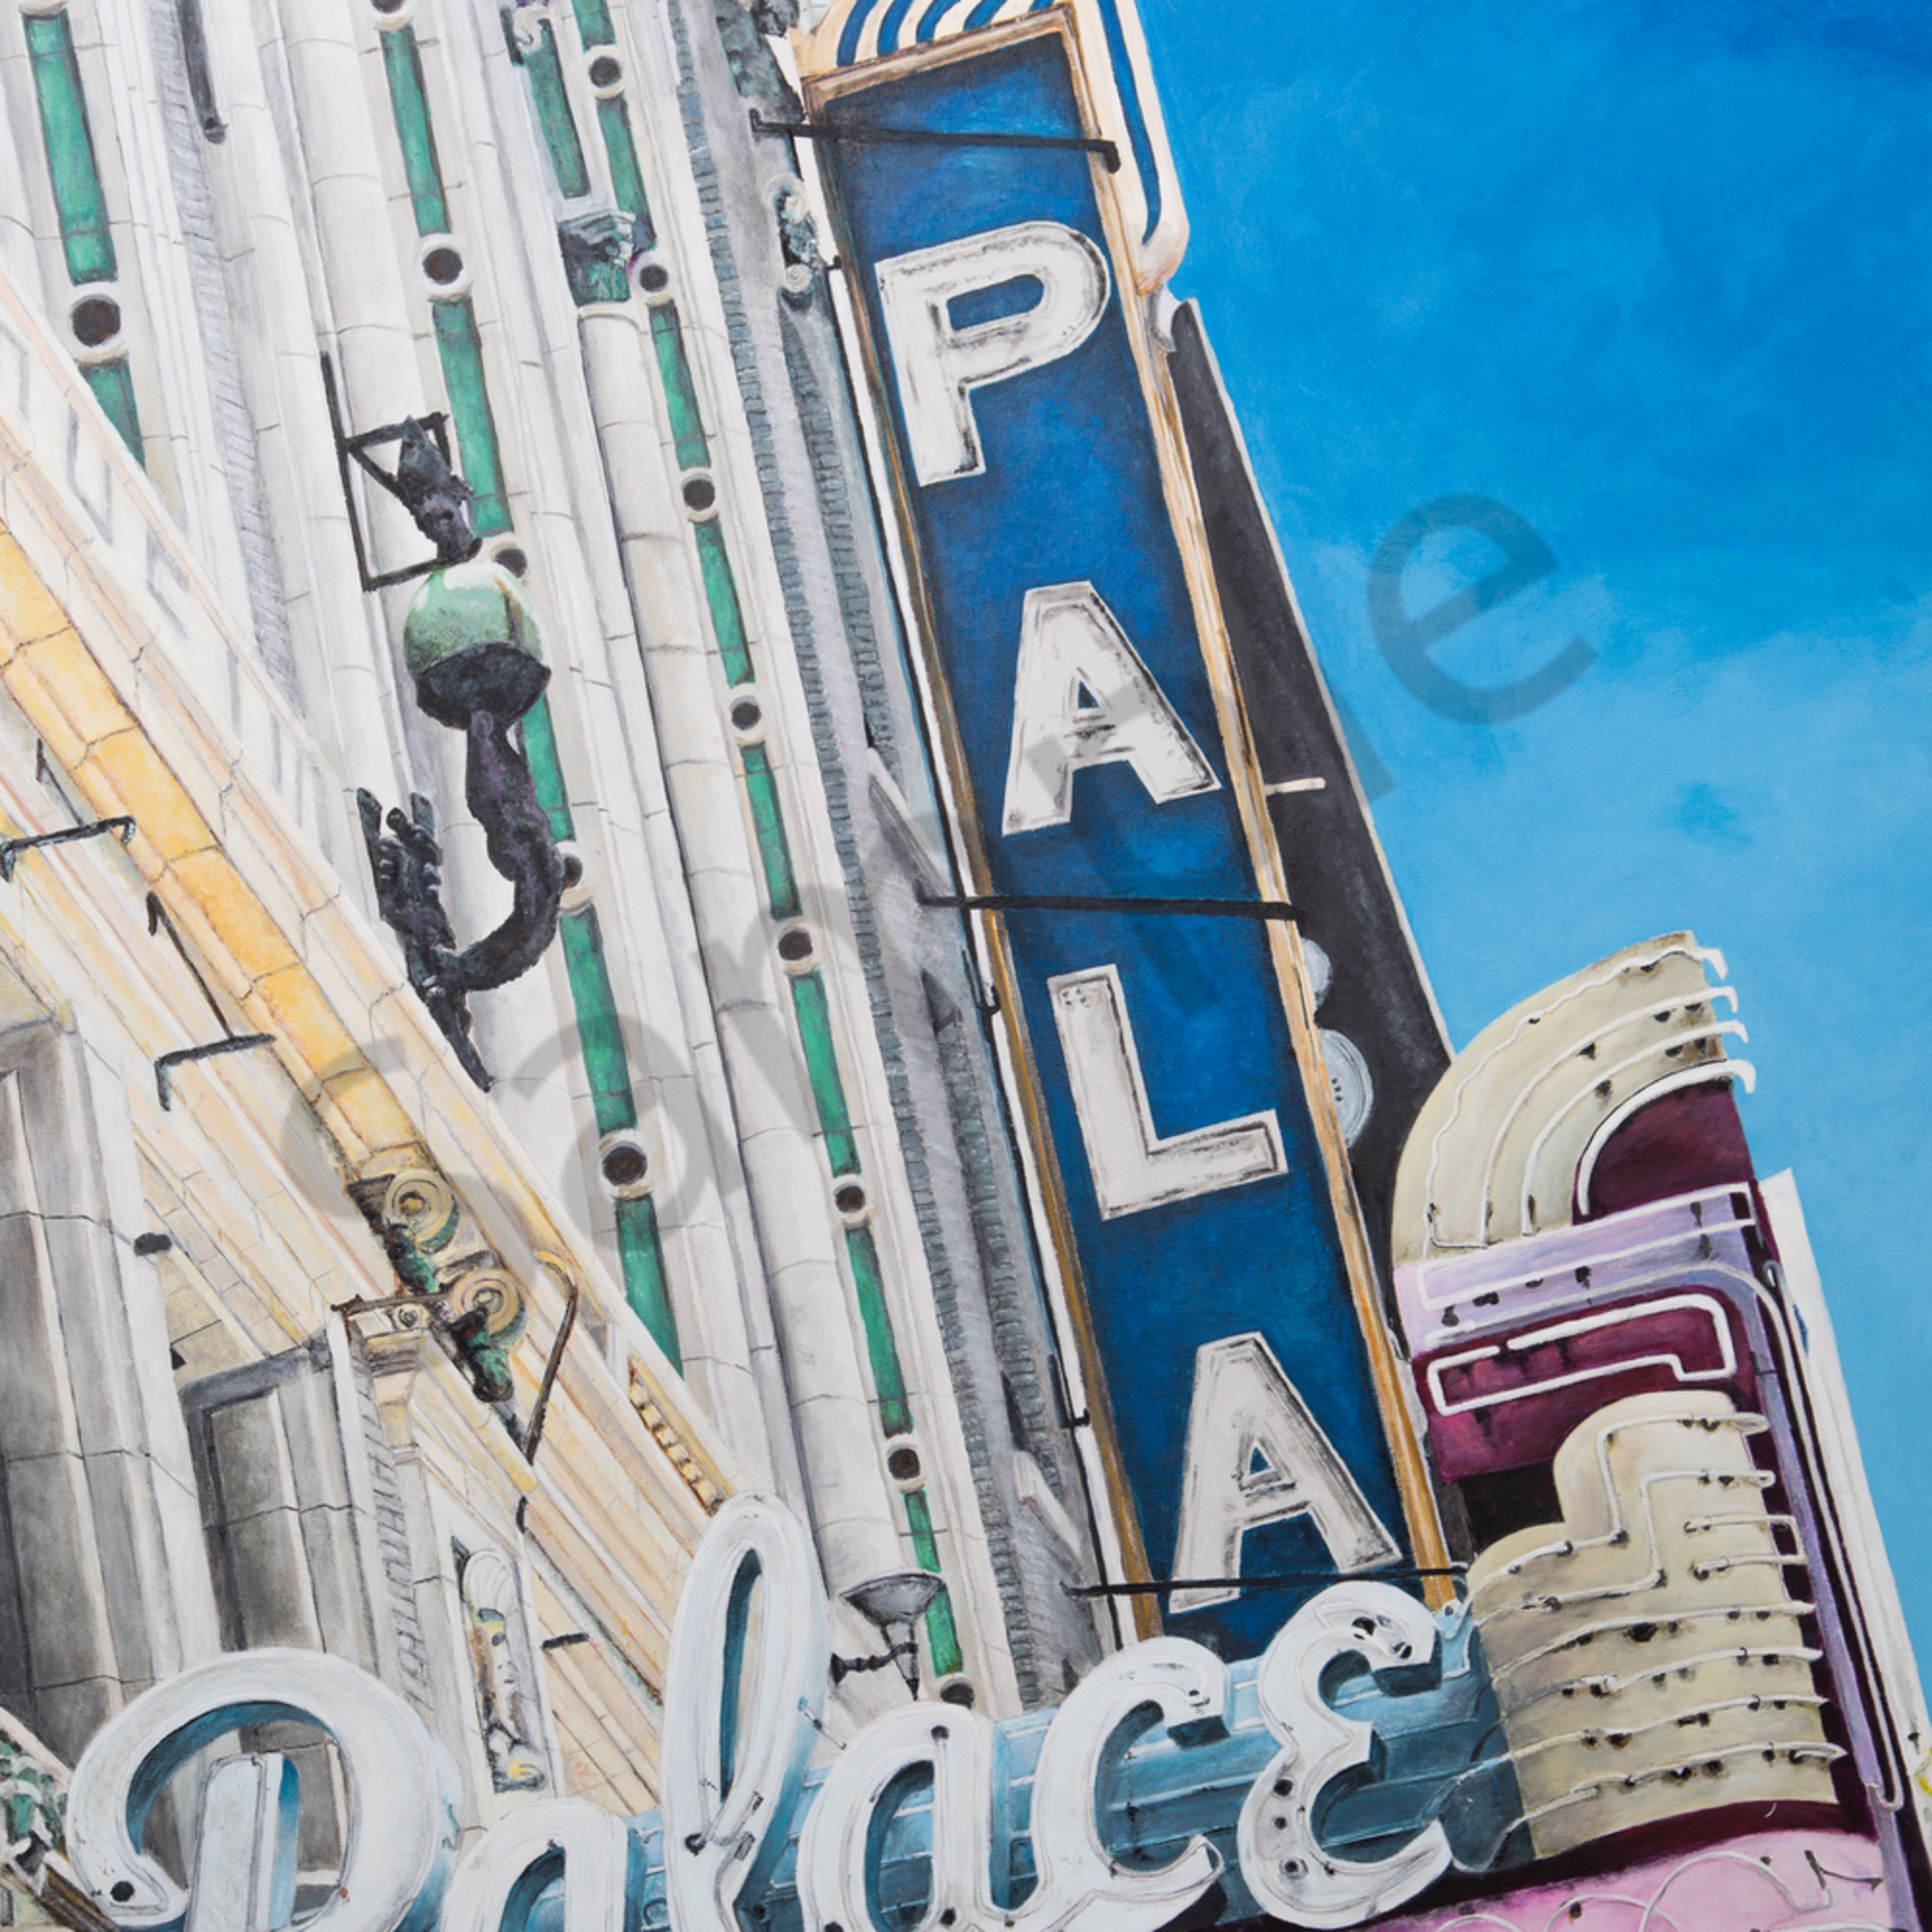 Palace theater 7135 iyneo2